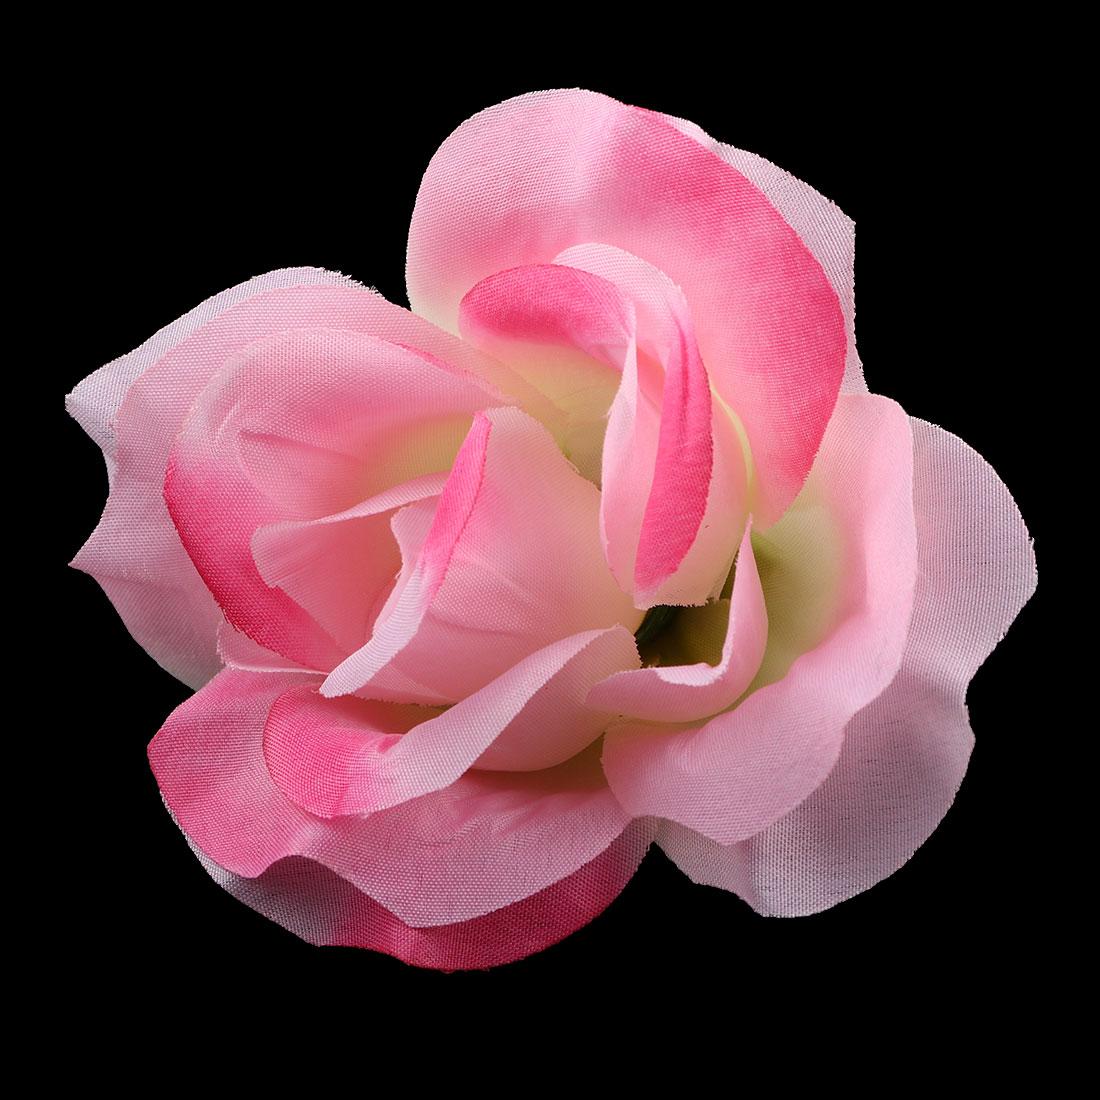 Office Bedroom Table Desk Handcraft Artificial Flower Rose Heads Decoration # 1 - image 3 of 4